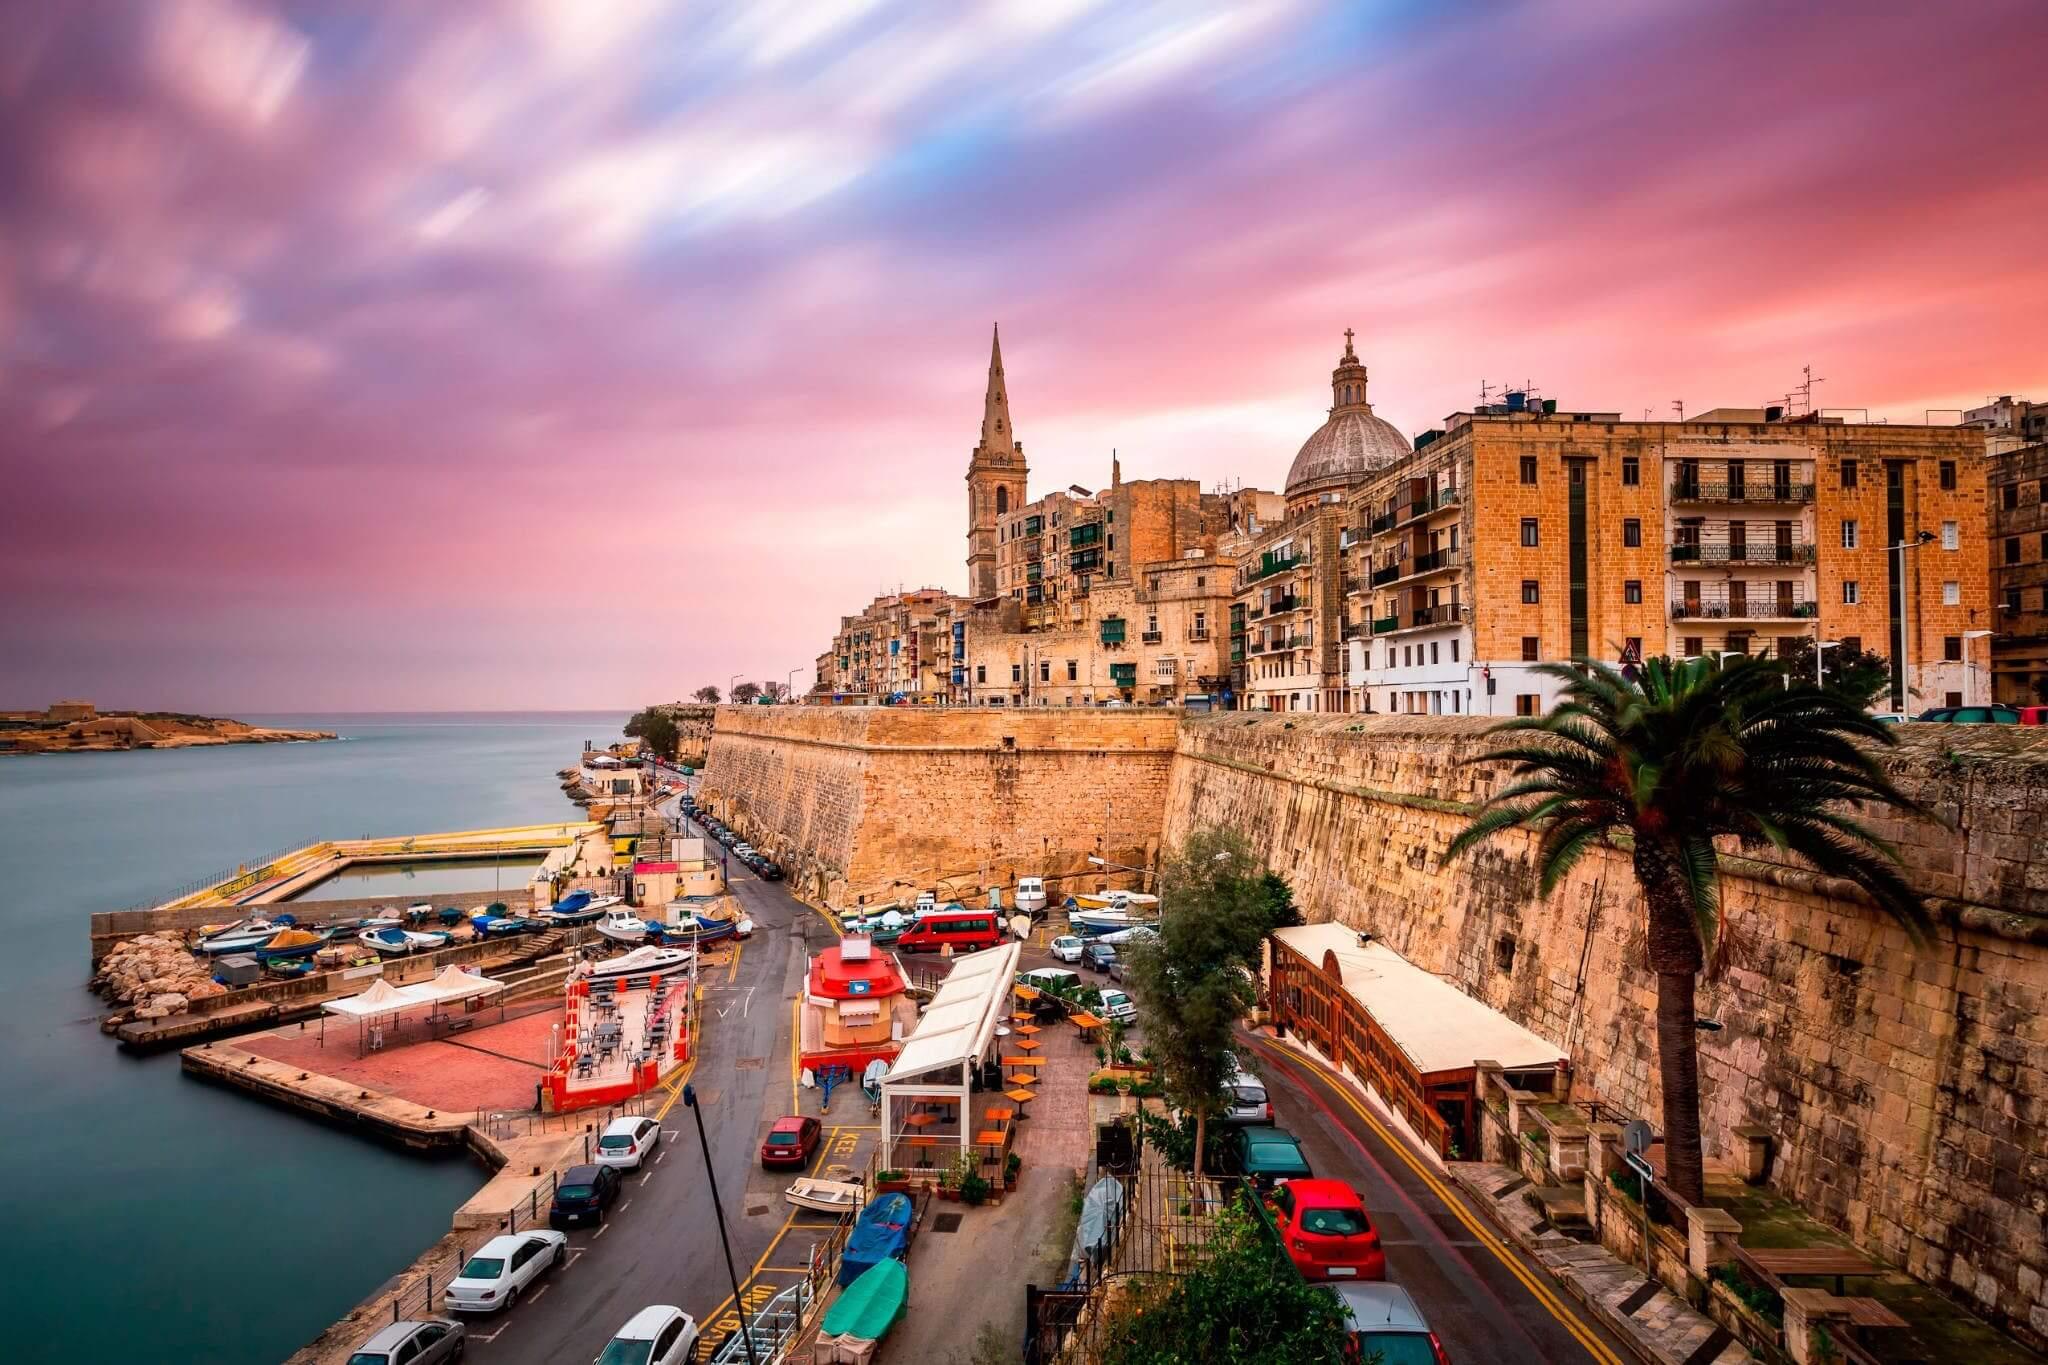 estudiar inglés en malta - el speaking